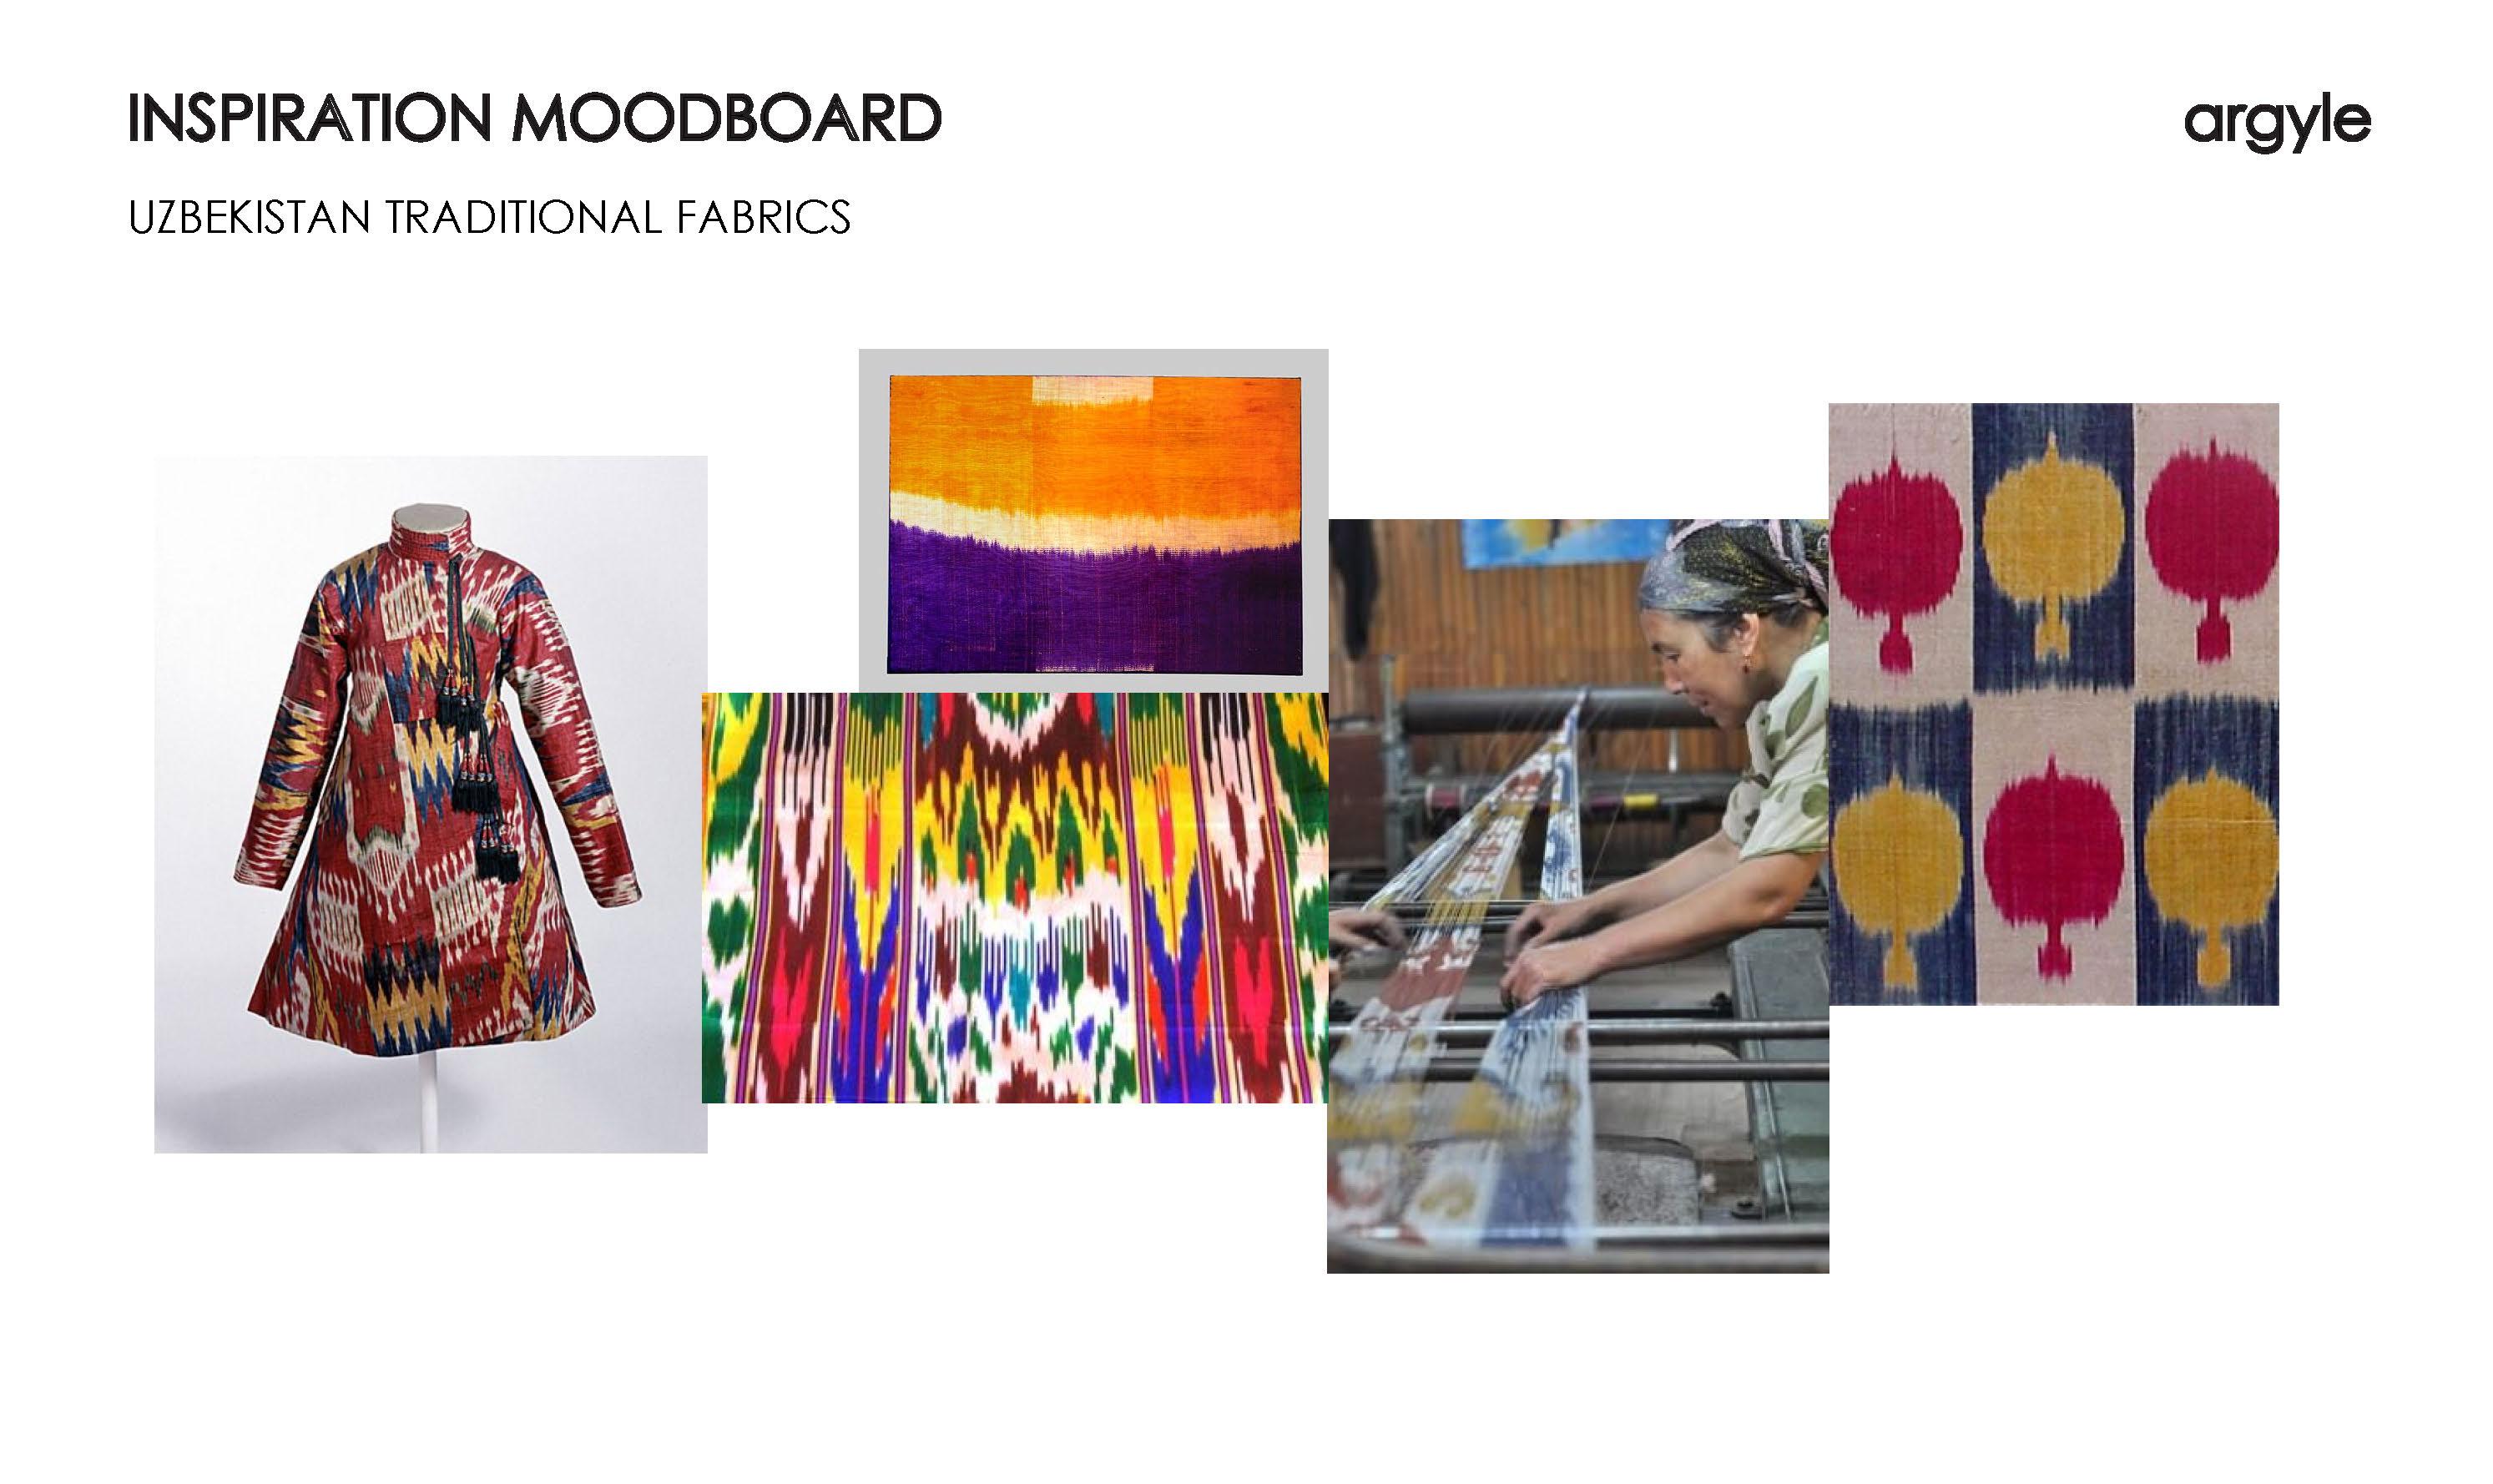 Moodboard-argyle.jpg